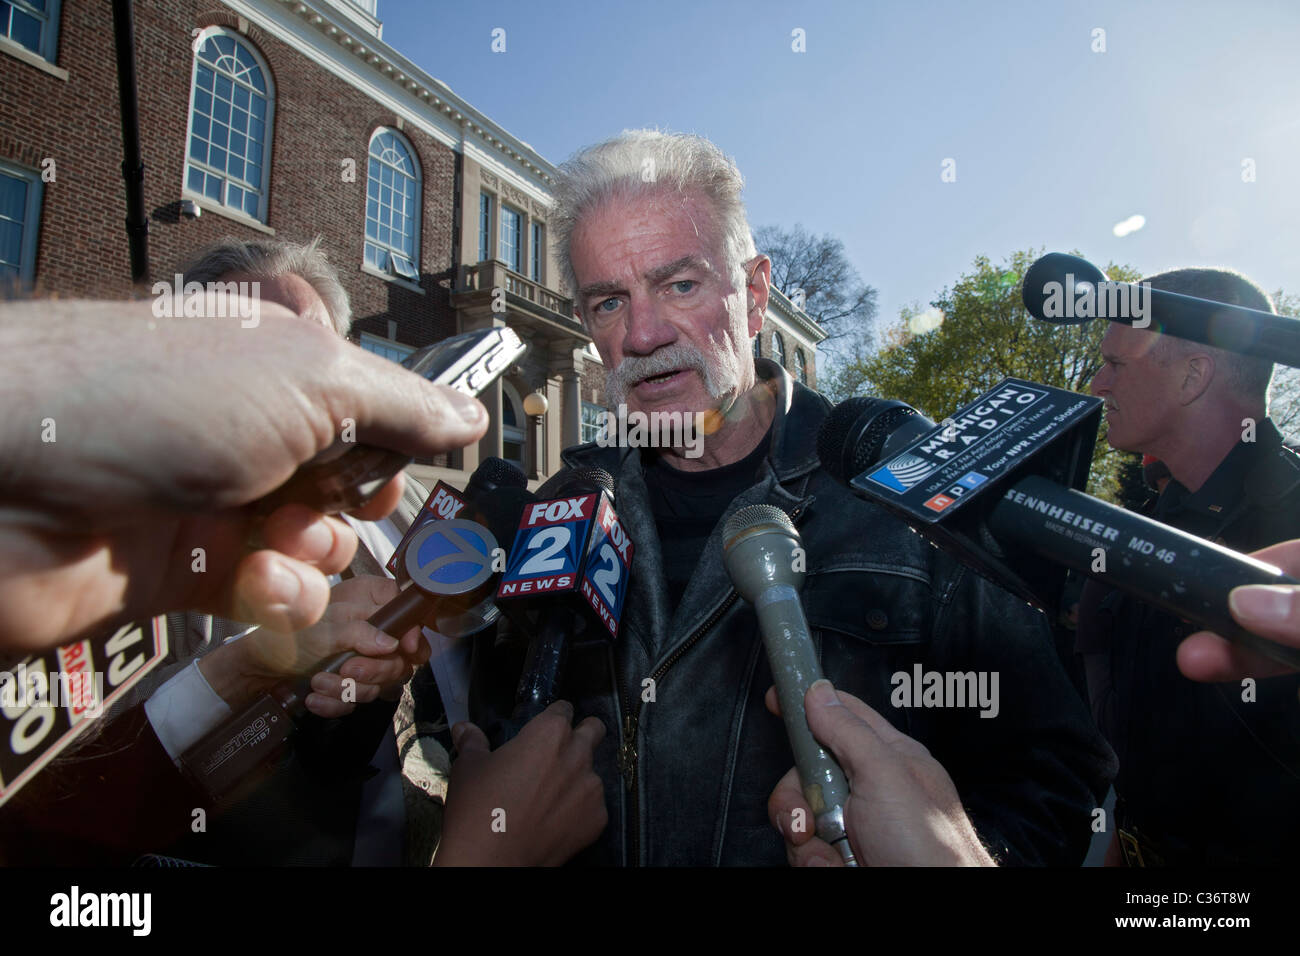 Quran-Burning Pastor from Florida Gets Hostile Reception in Michigan - Stock Image